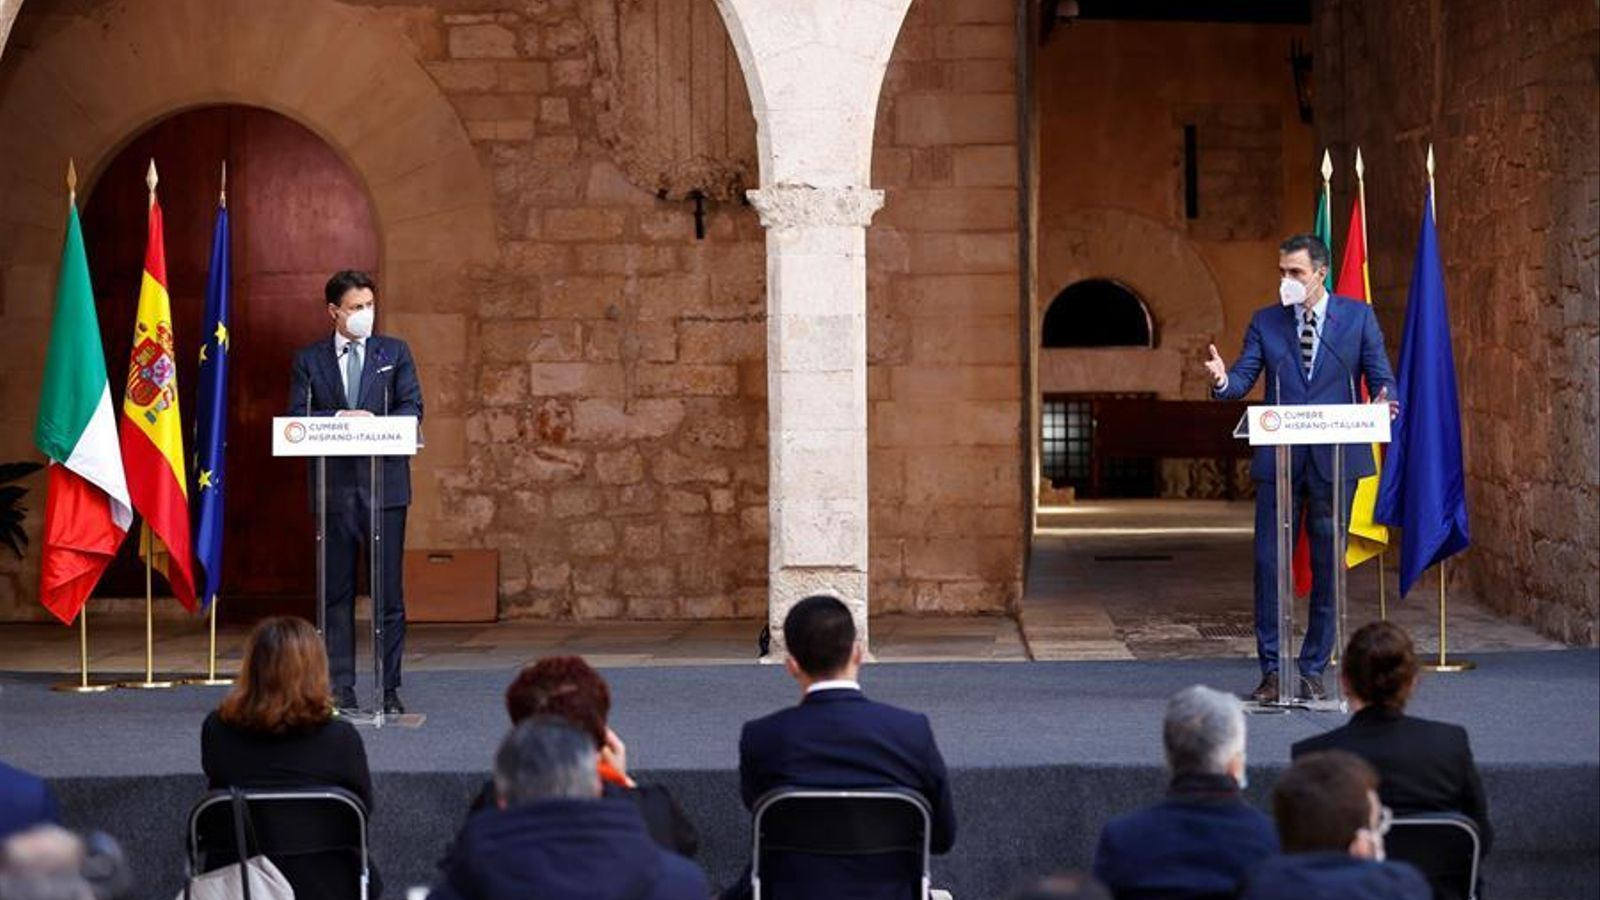 El primer ministre italià, Giuseppe Conte, i el president del govern espanyol, Pedro Sánchez